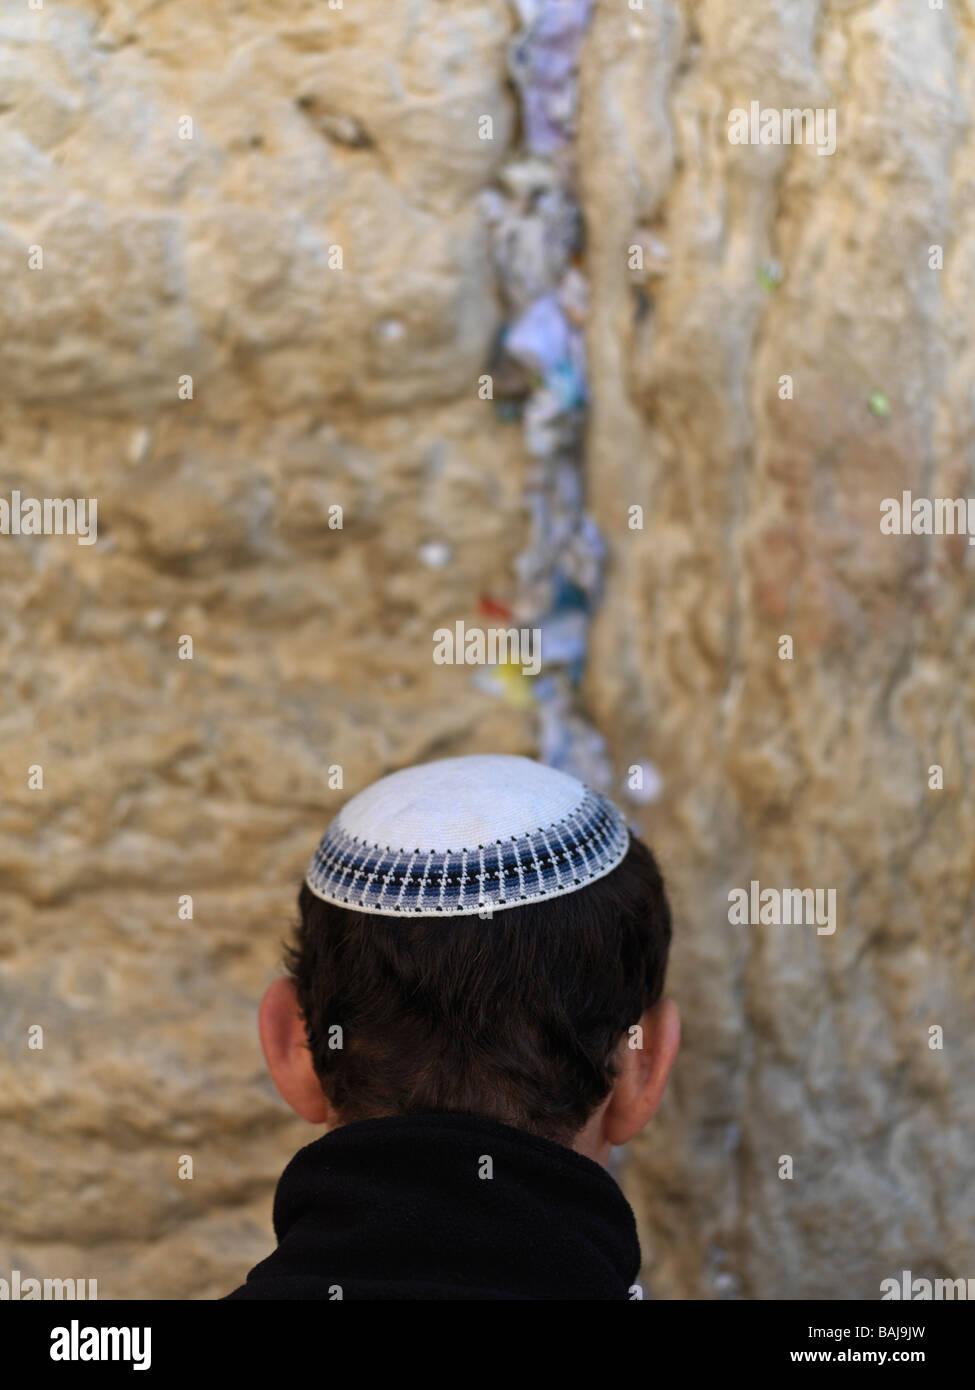 Israel Jerusalem Western Wall or Wailing Wall with worshiper Stock Photo